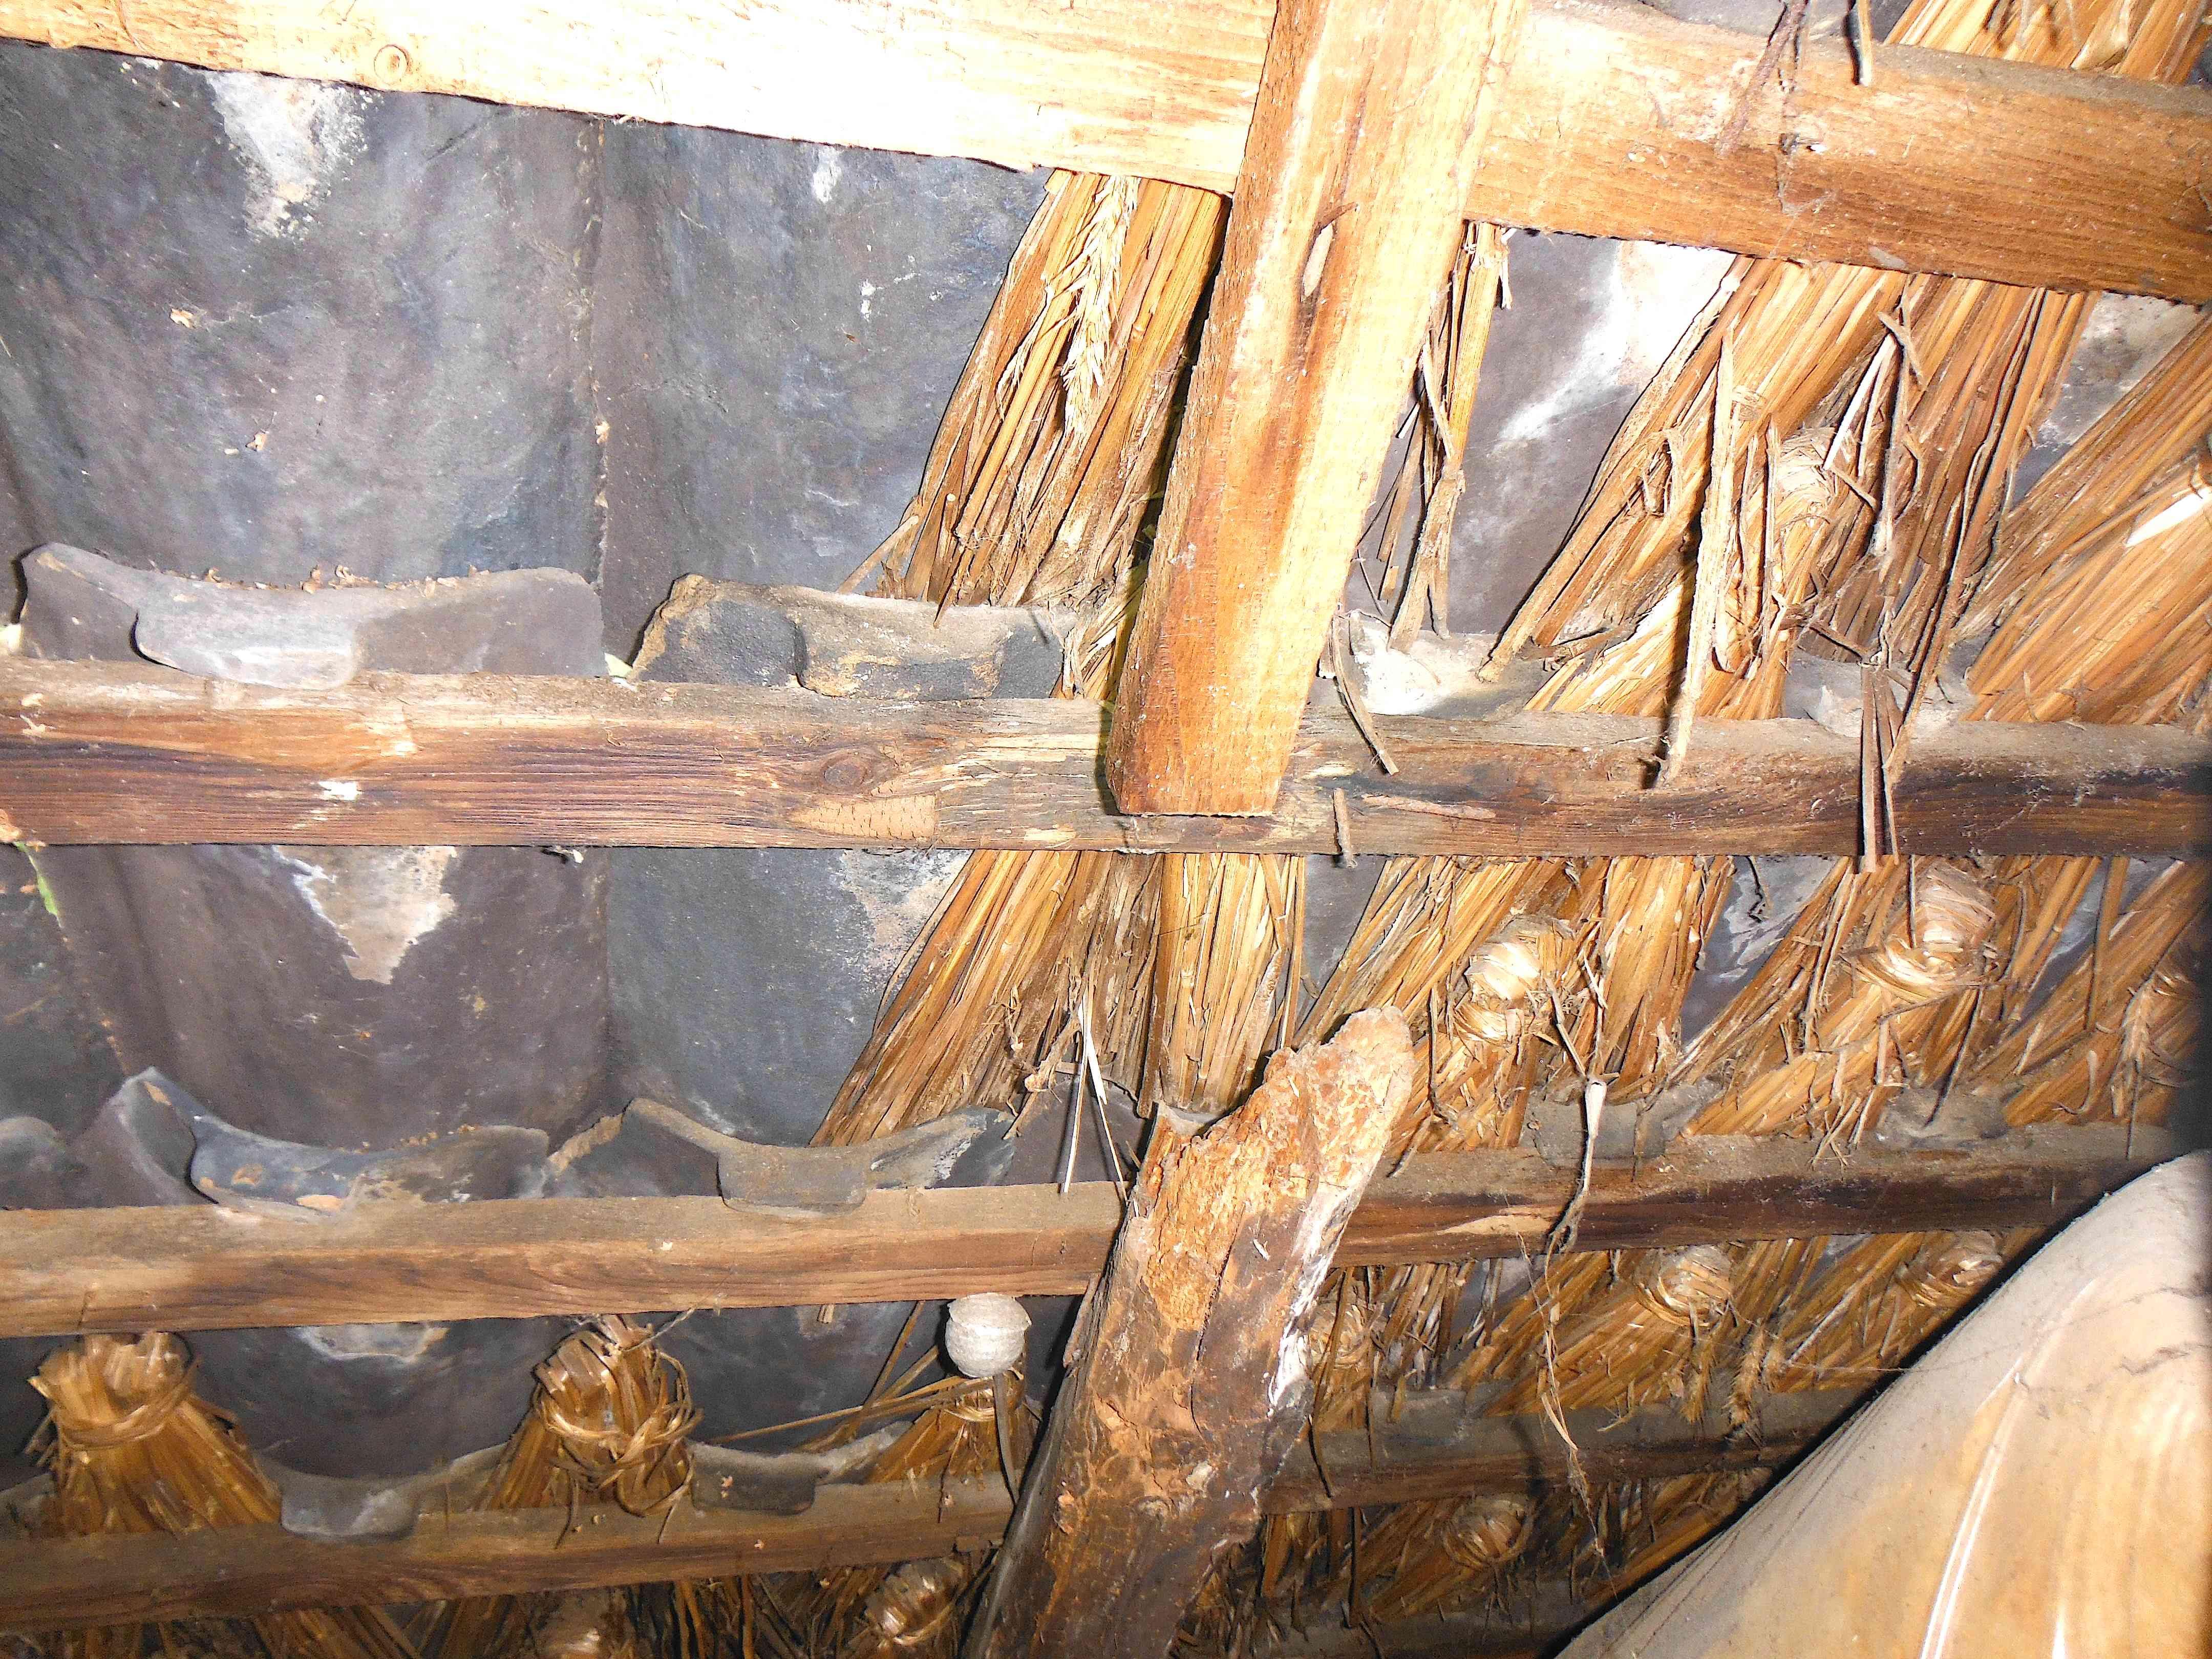 Dachstuhl DG | vermorschter, gebrochener Sparren